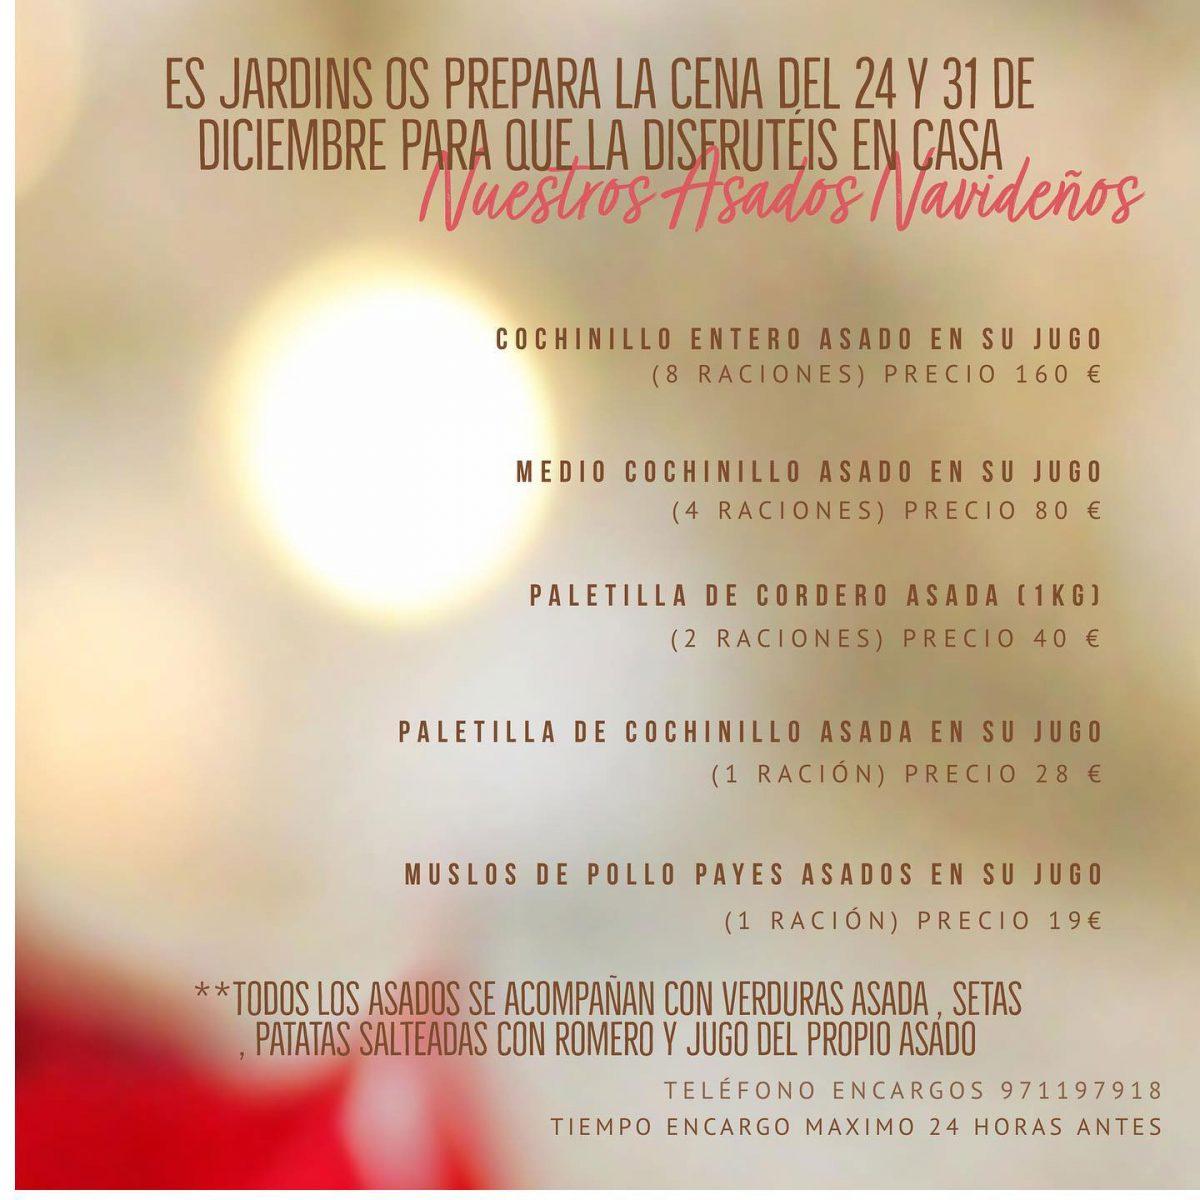 restaurant-es-jardins-de-fruitera-diner-kerst-oudejaarsavond-ibiza-take-home-2020-welcometoibiza